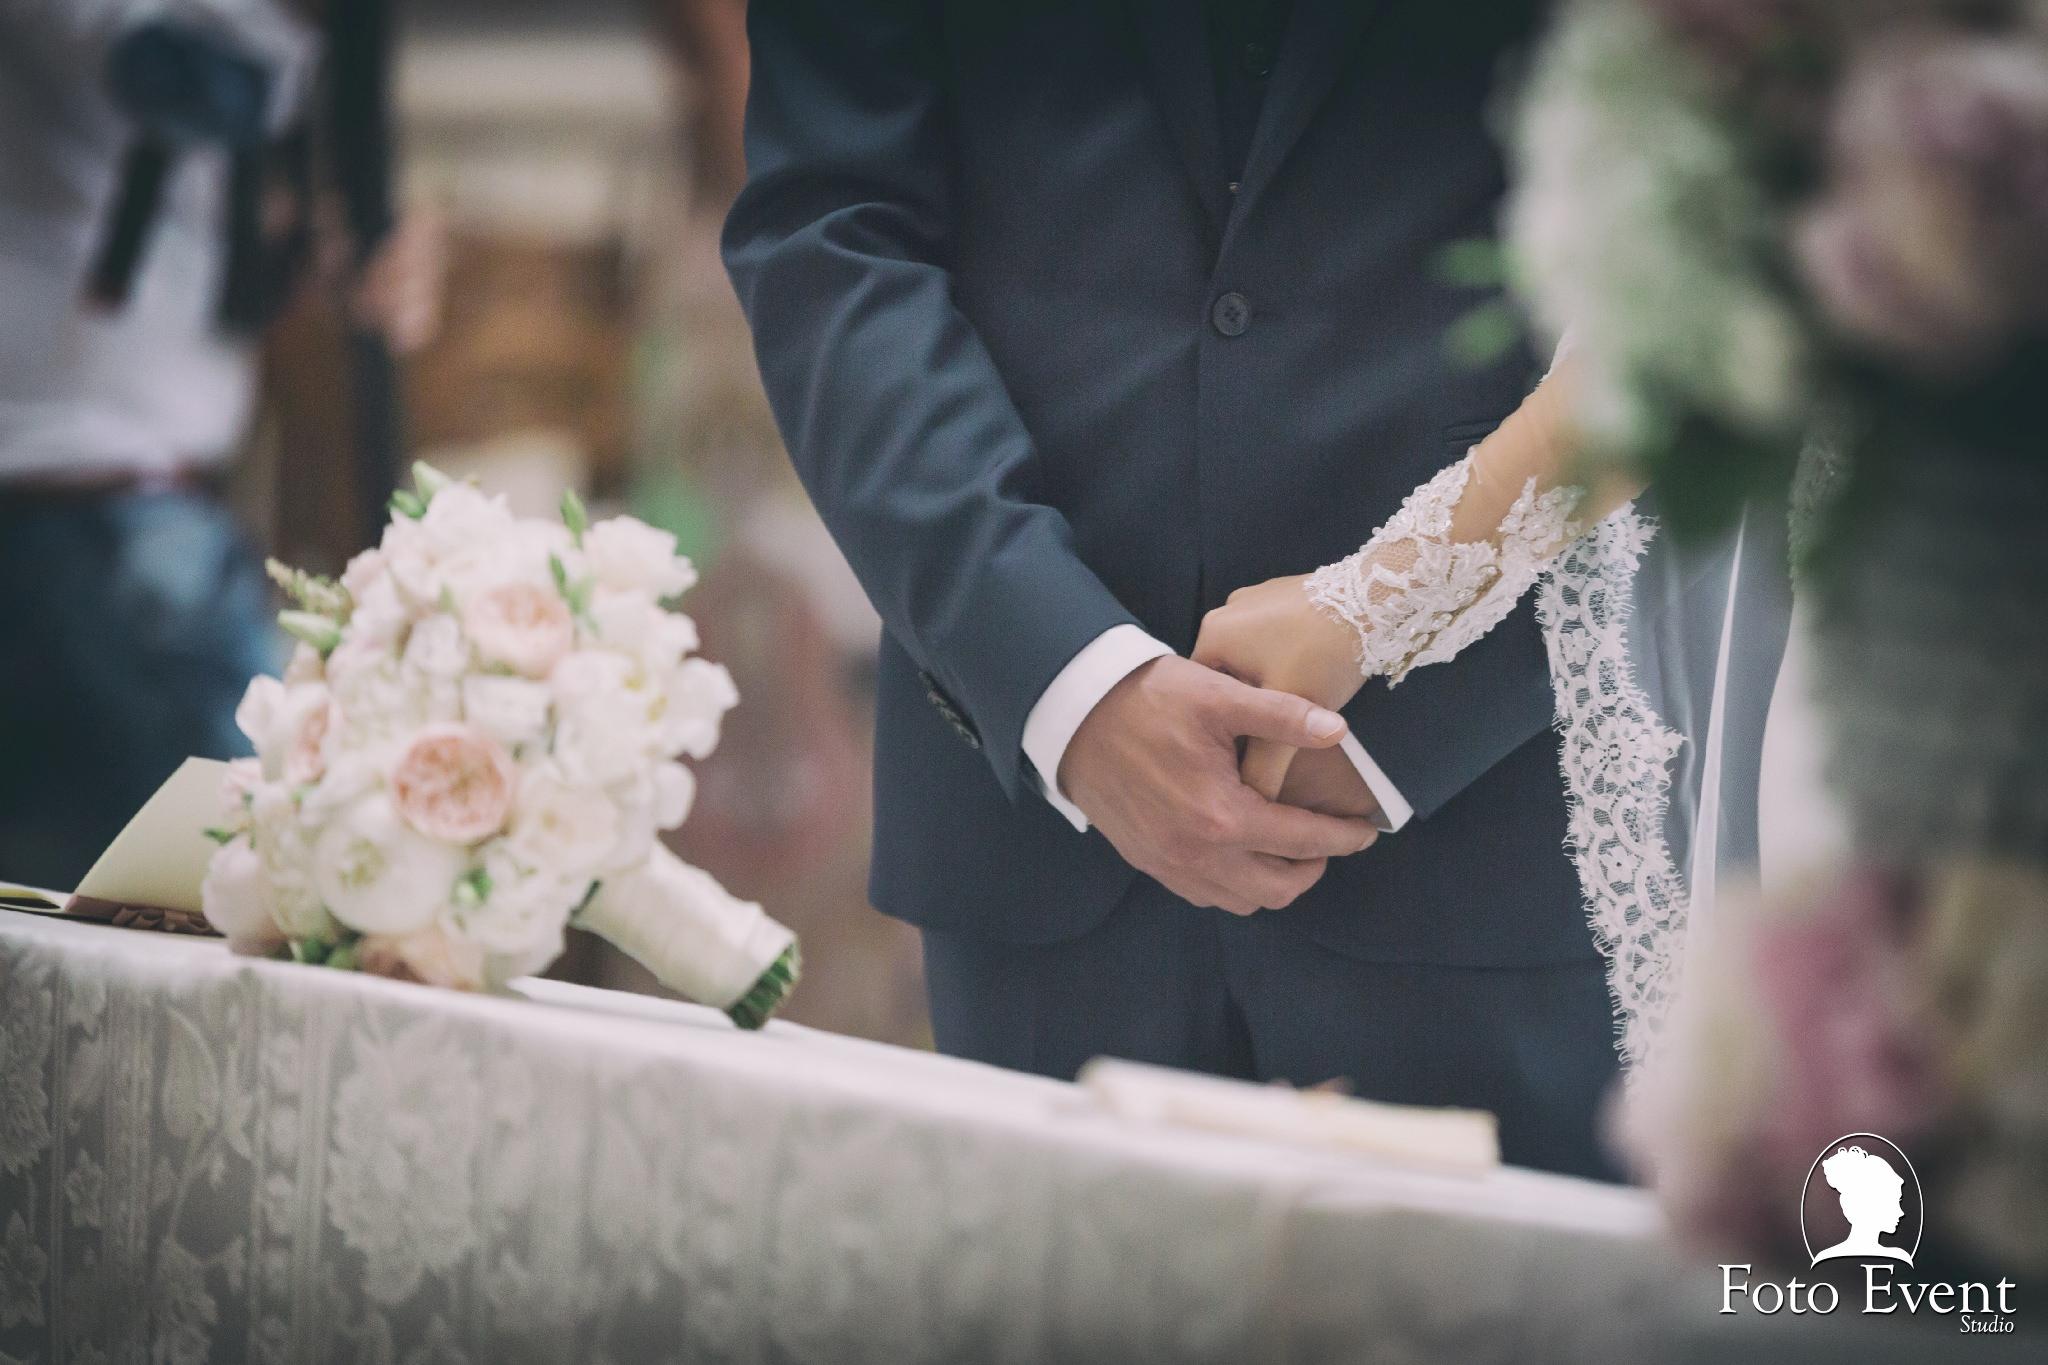 2017-07-21 Matrimonio Adriana e Giuseppe Dorsi zoom 100 CD FOTO